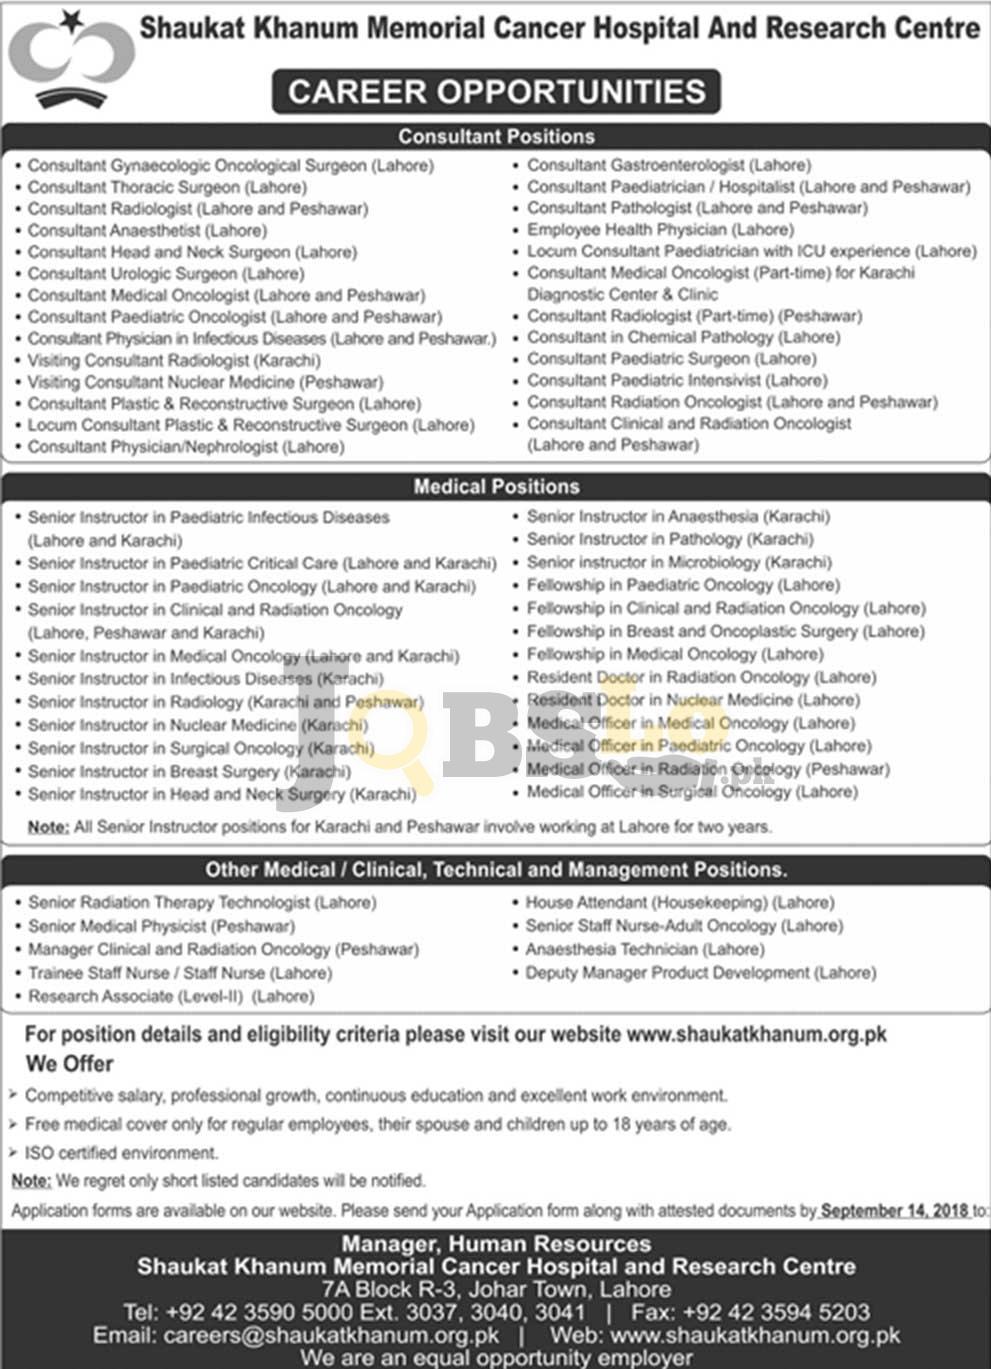 Shaukat Khanum Cancer Hospital Jobs 2018 in Pakistan